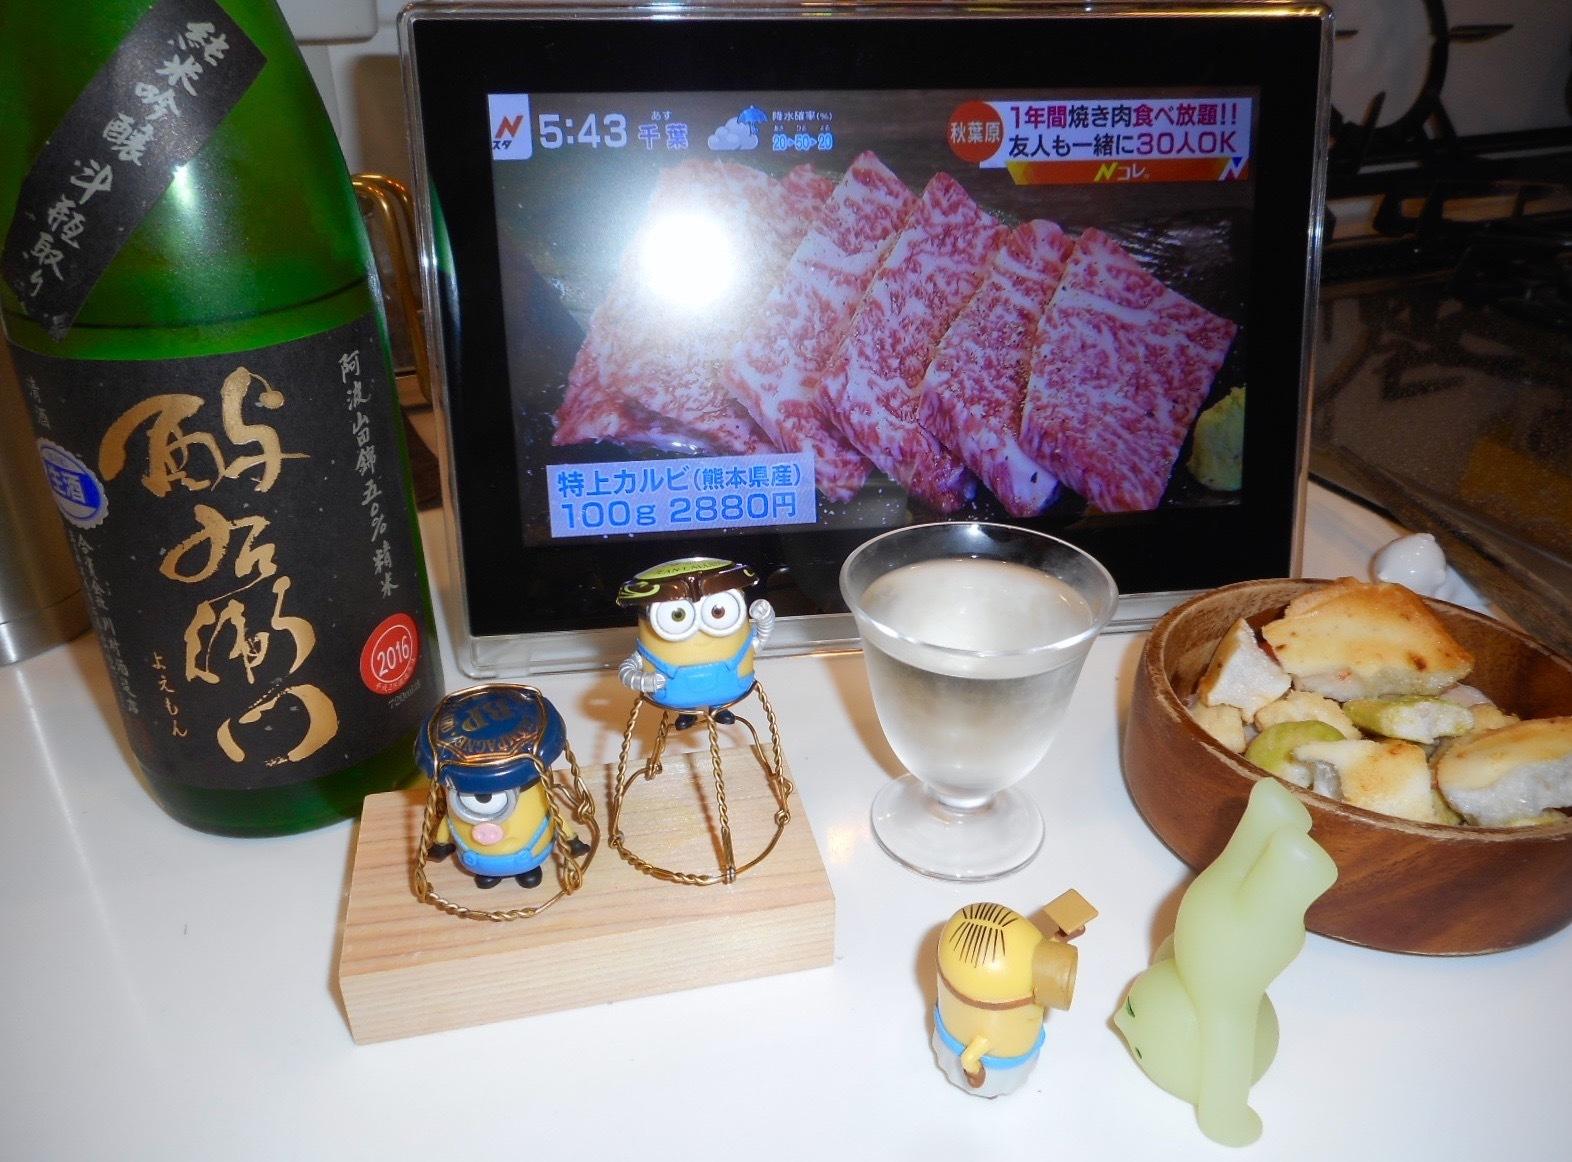 yoemon_yamada50tobin28by8.jpg